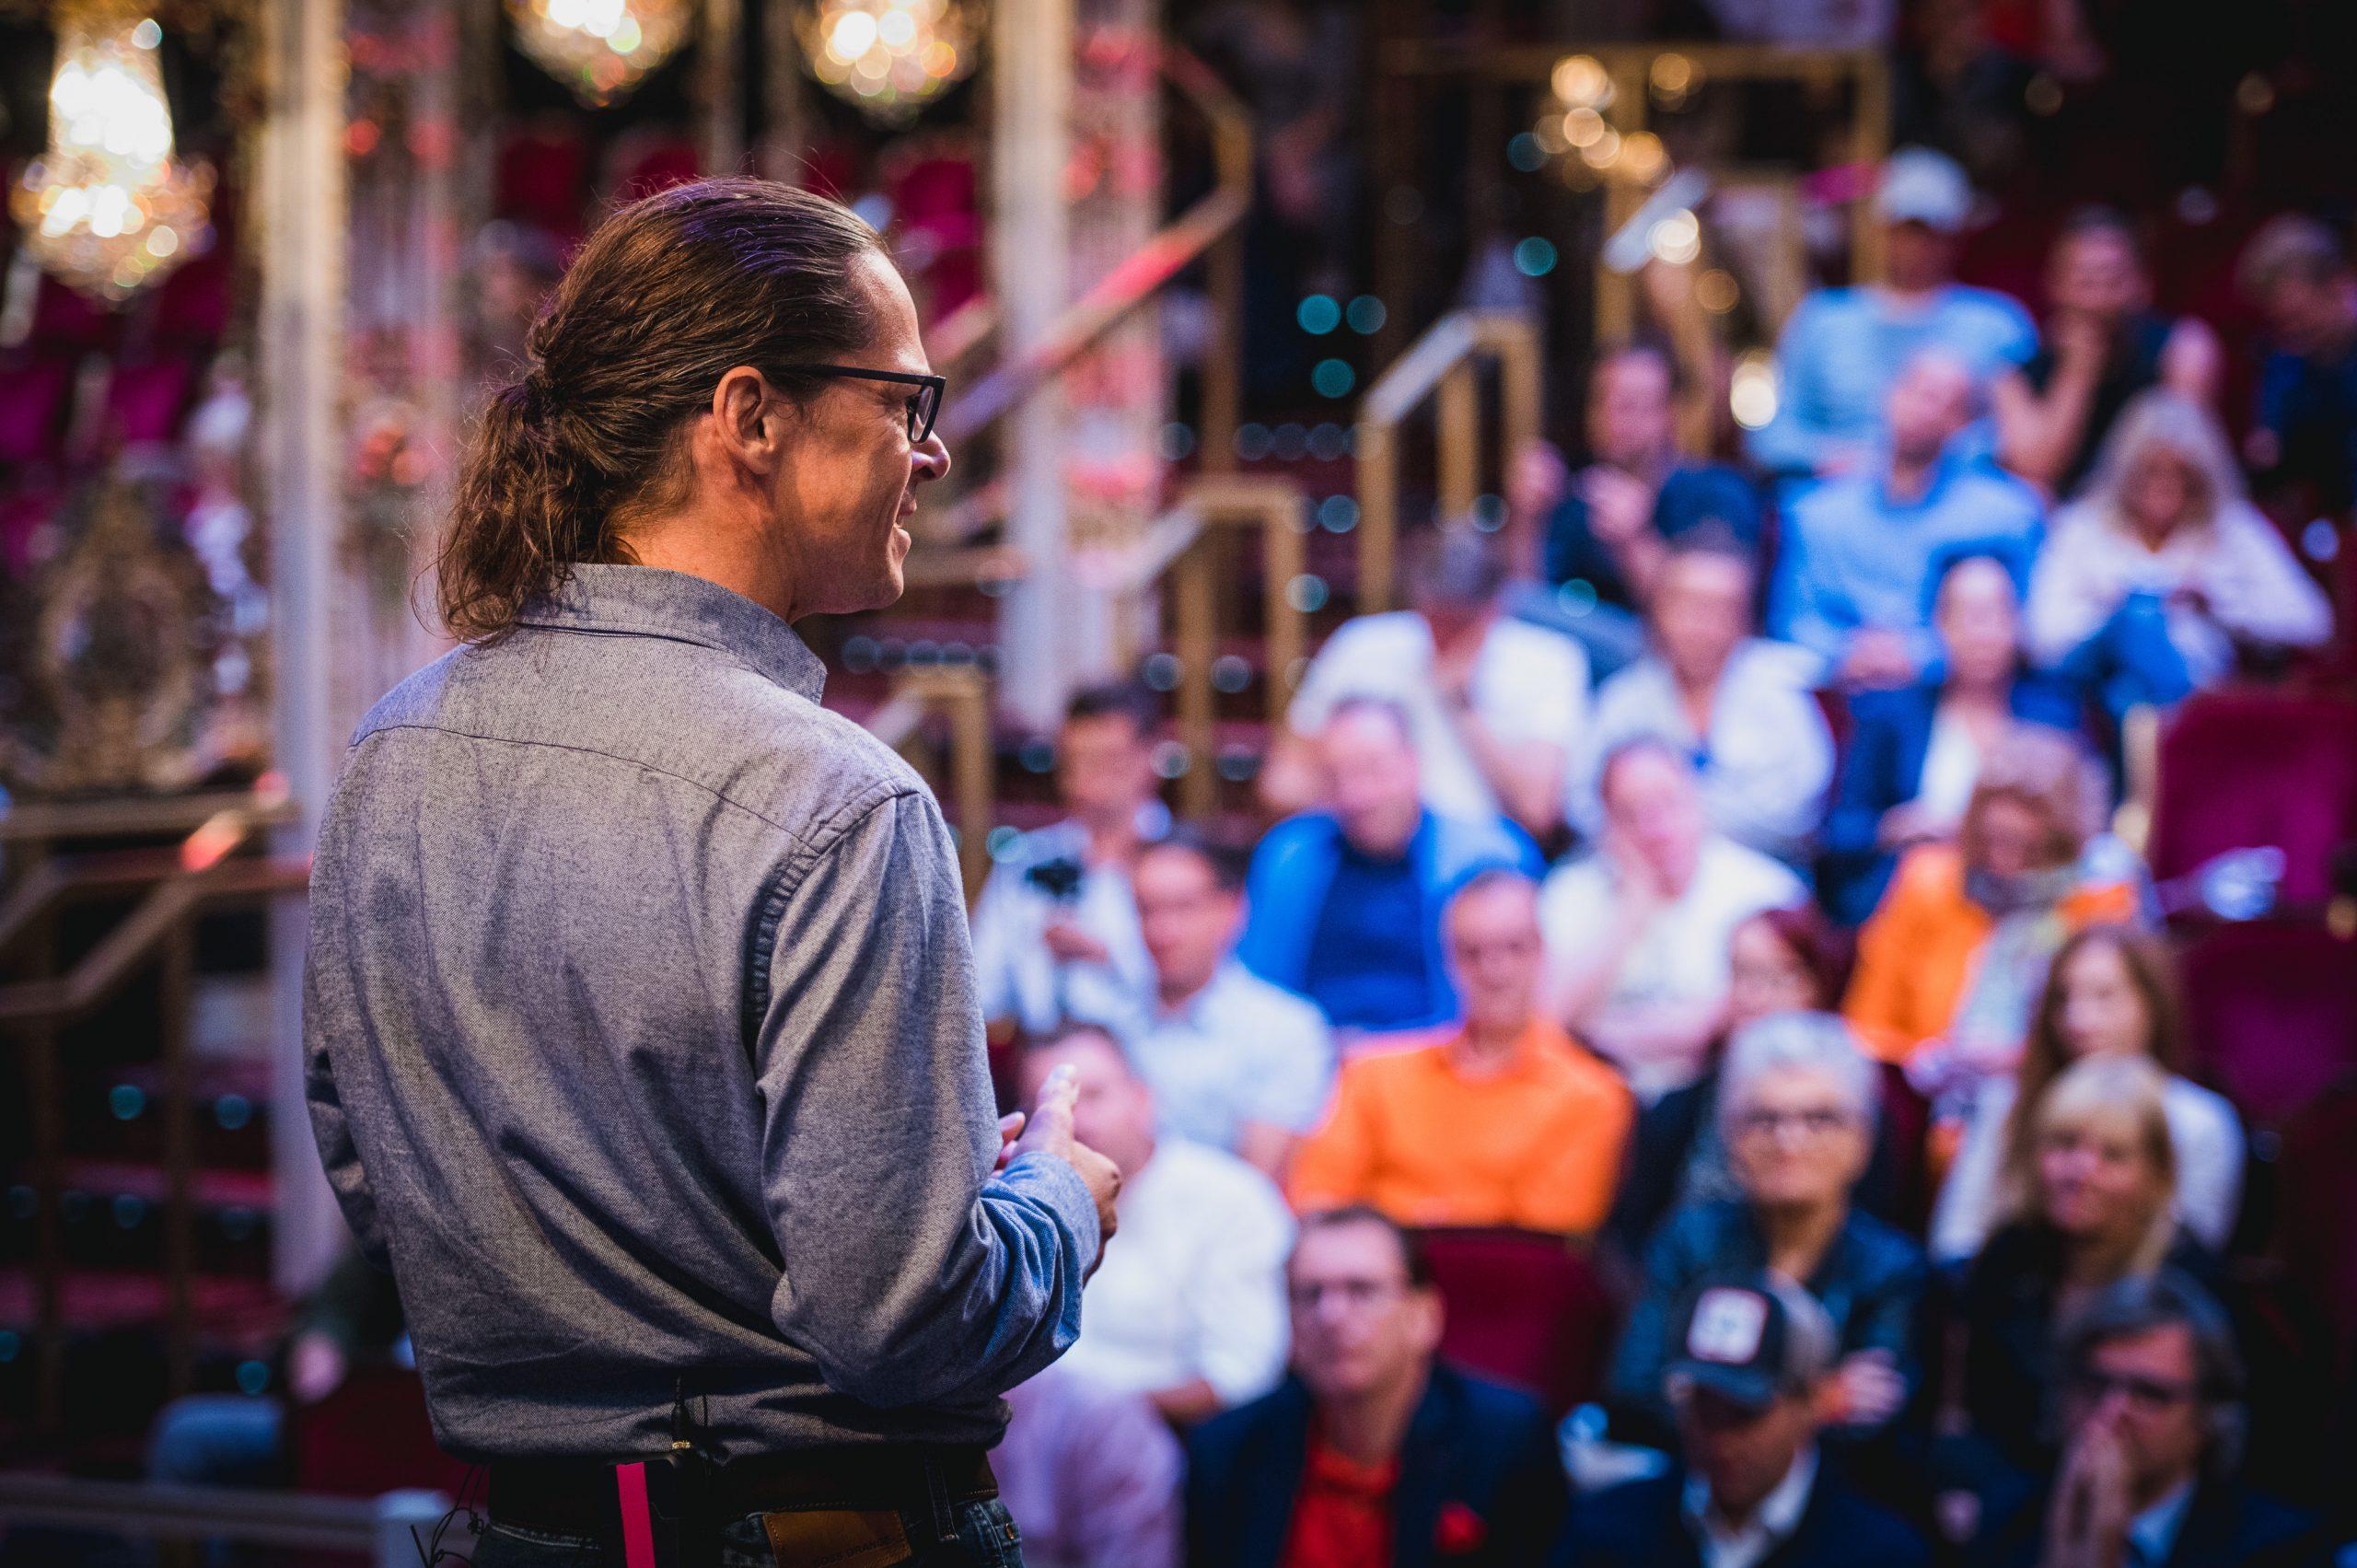 Werner Hampel begeistert Zuhörer beim Internationalen Speakerslam in New York